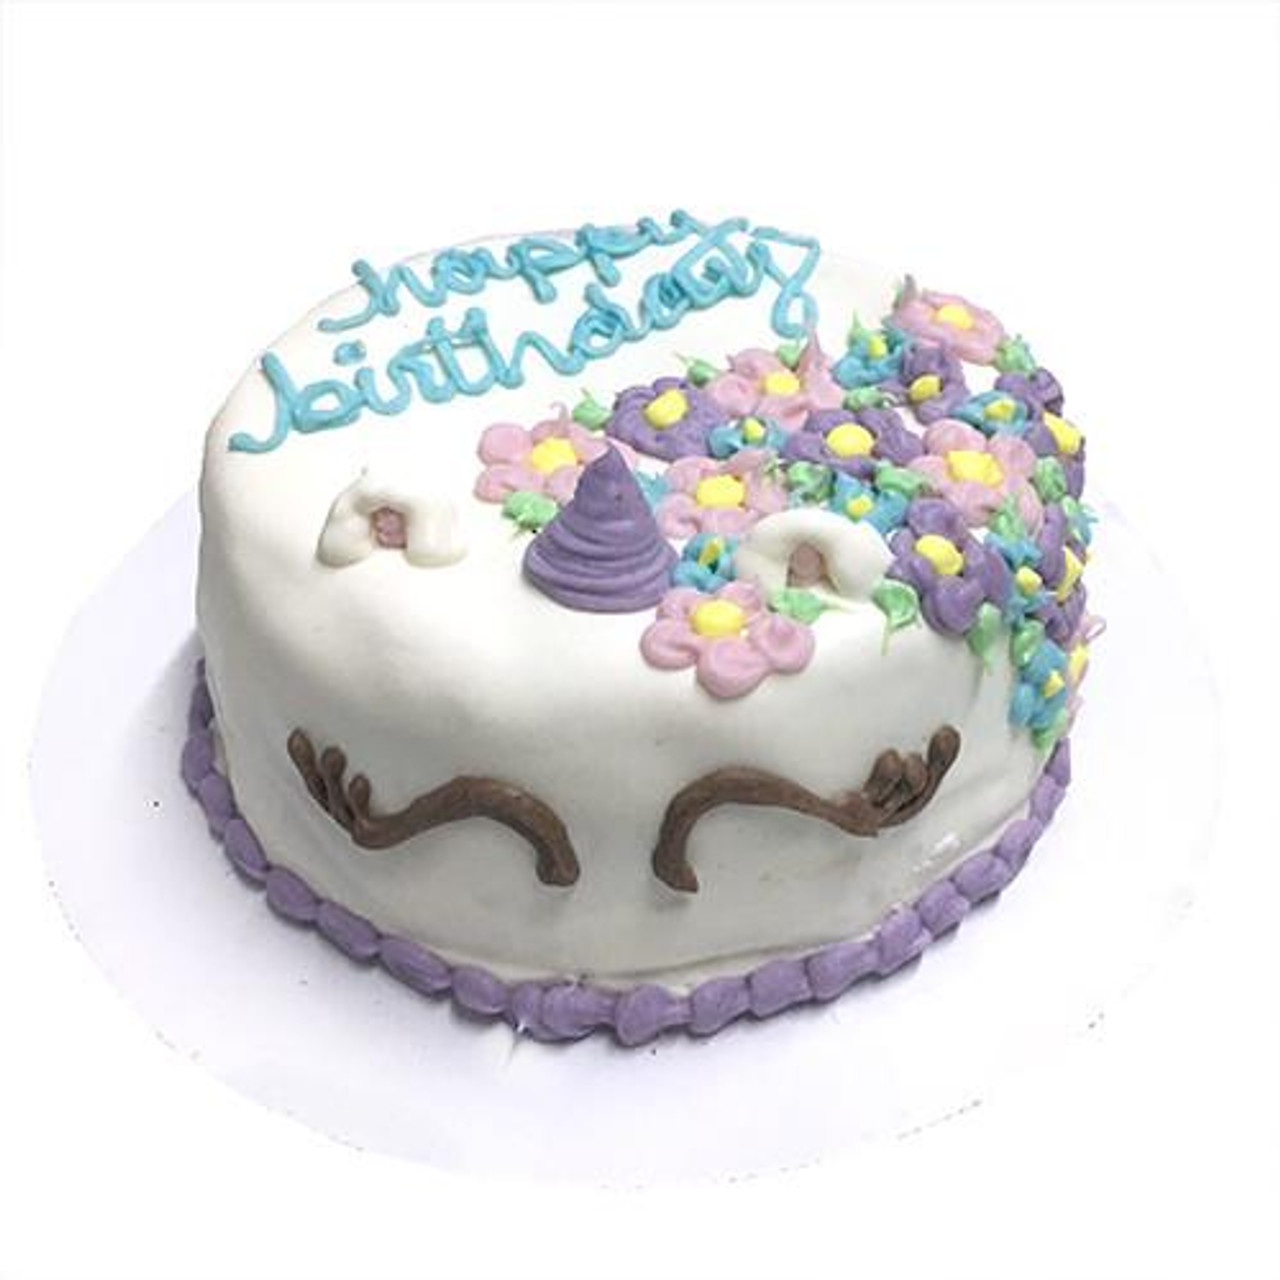 Customized Unicorn Birthday Cakes For Dogs